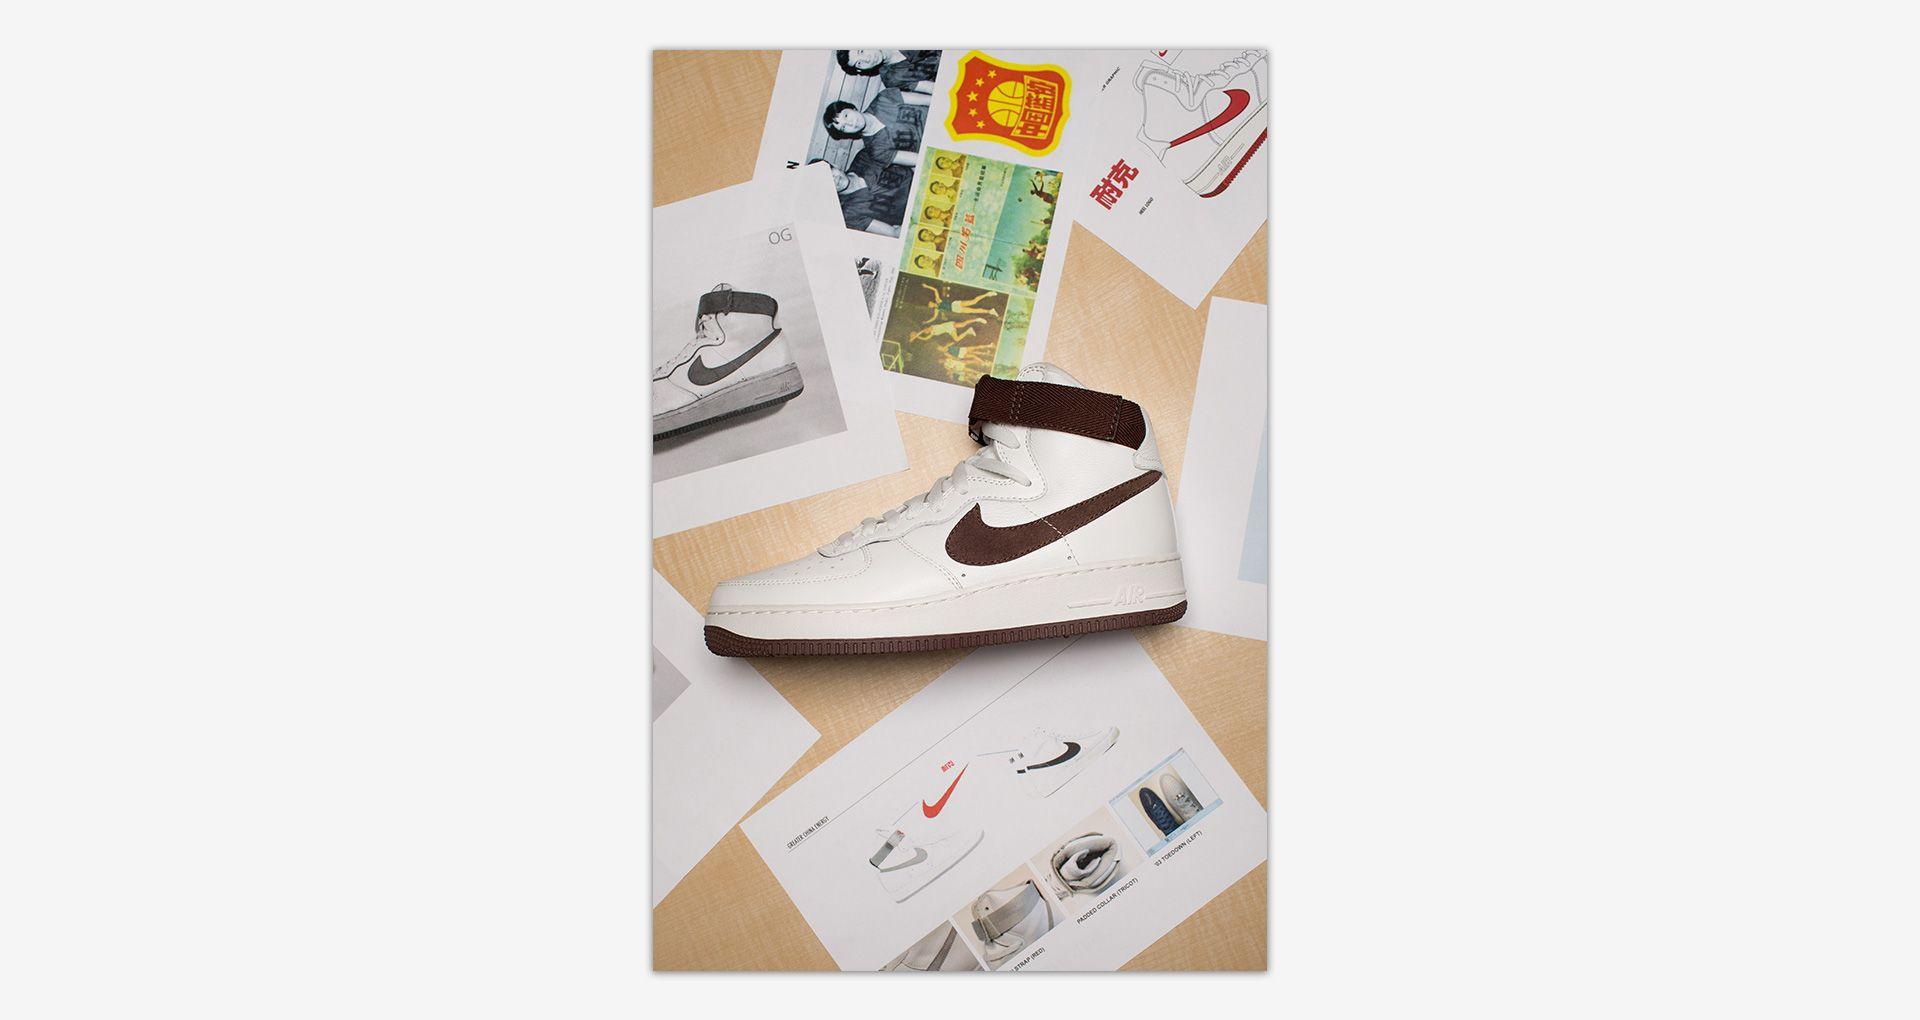 Dietro al design: Nike Air Max 1 OG Remaster. Nike+ Launch IT